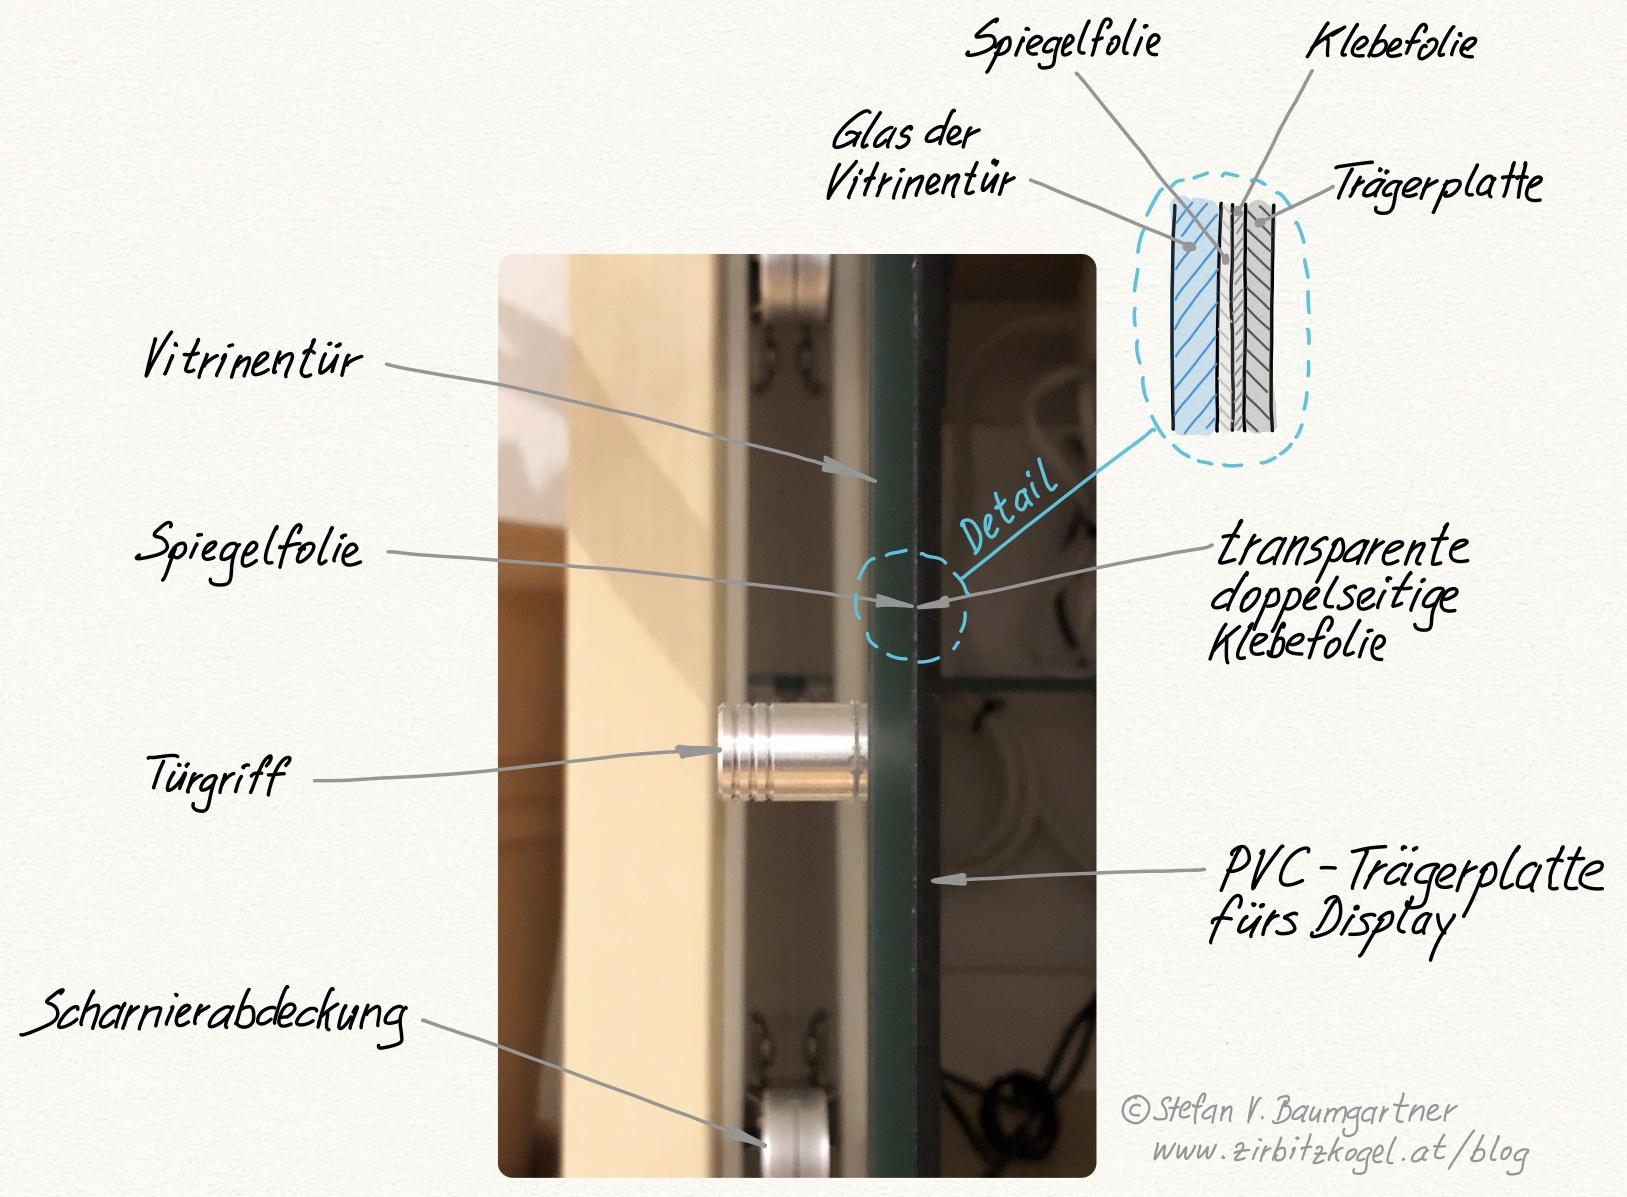 Querschnitt der modifizierten Vitrinentür